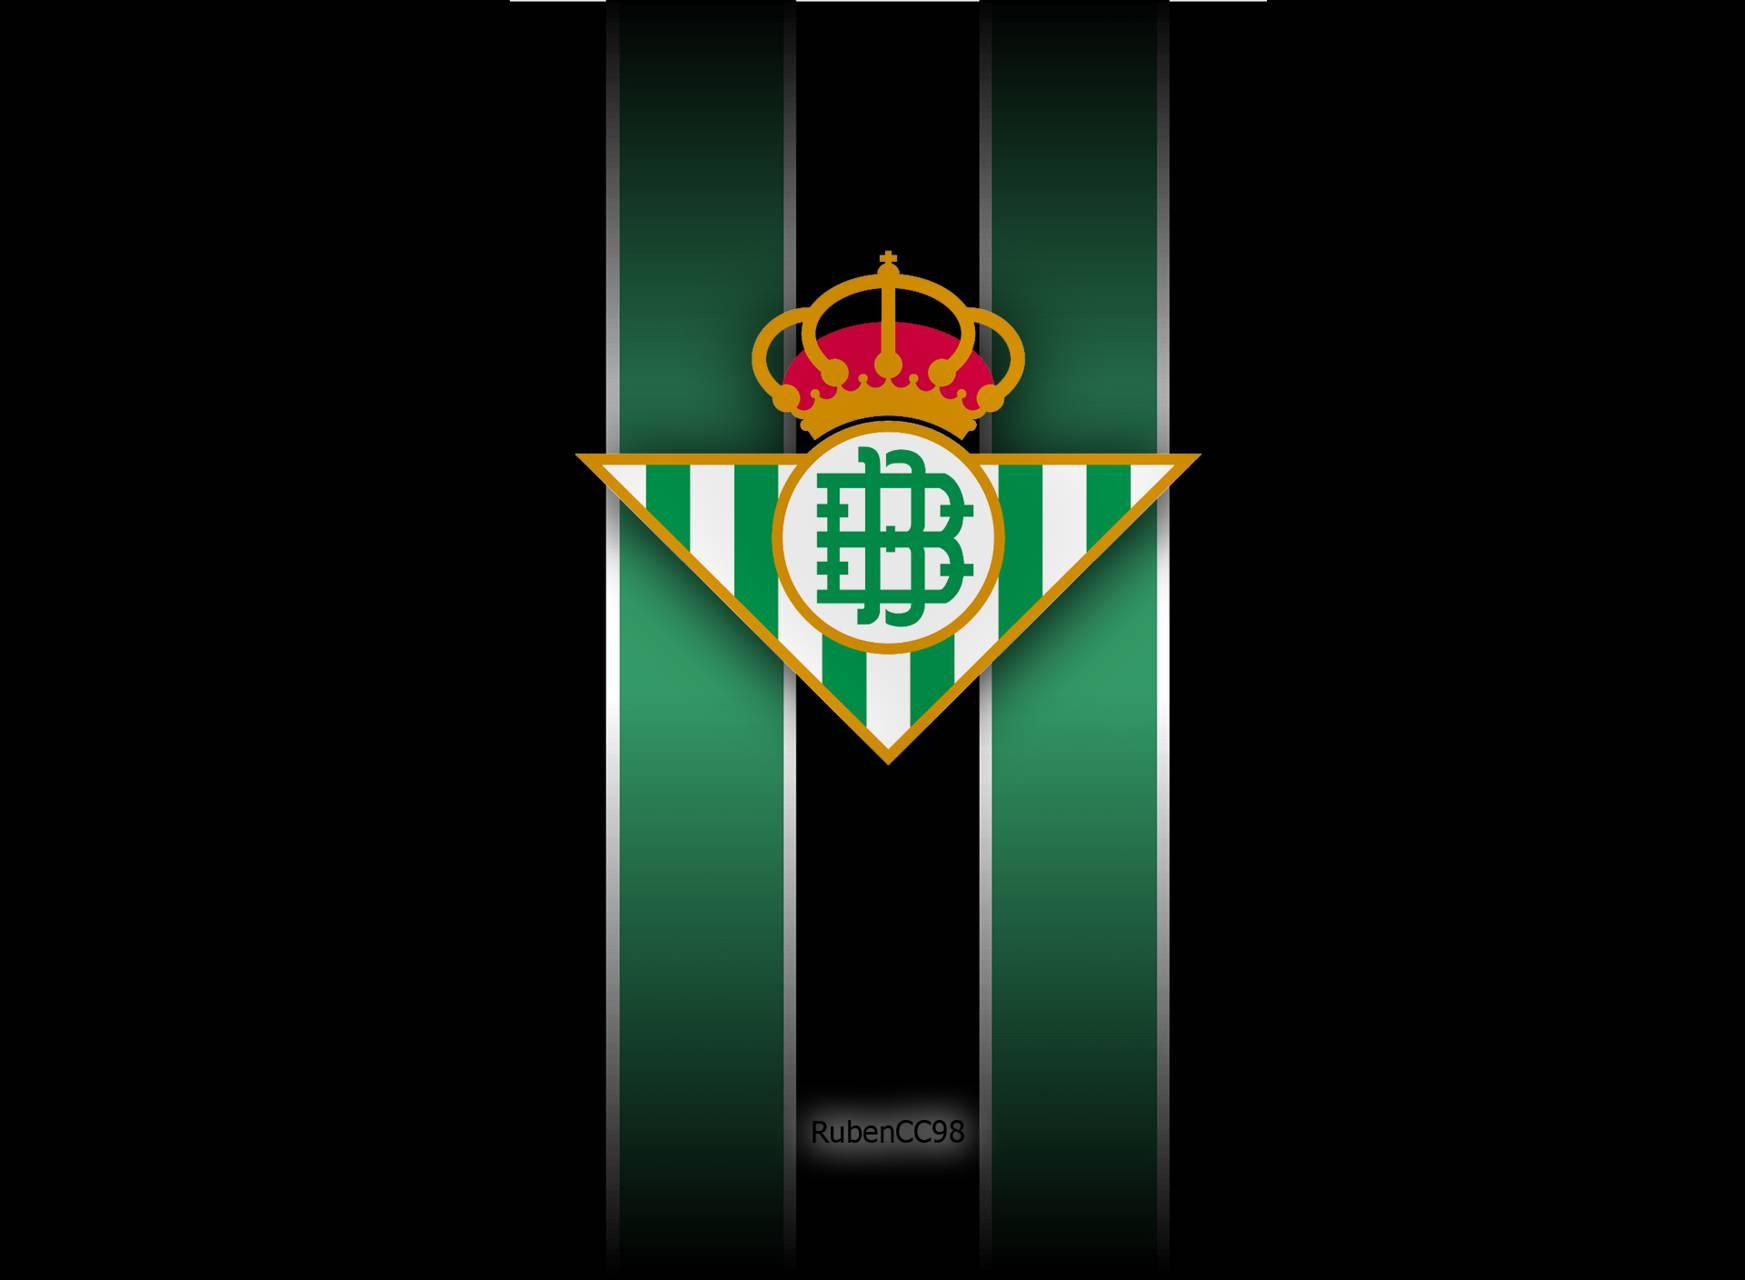 Real Betis Balompie Wallpaper By Rubencc98